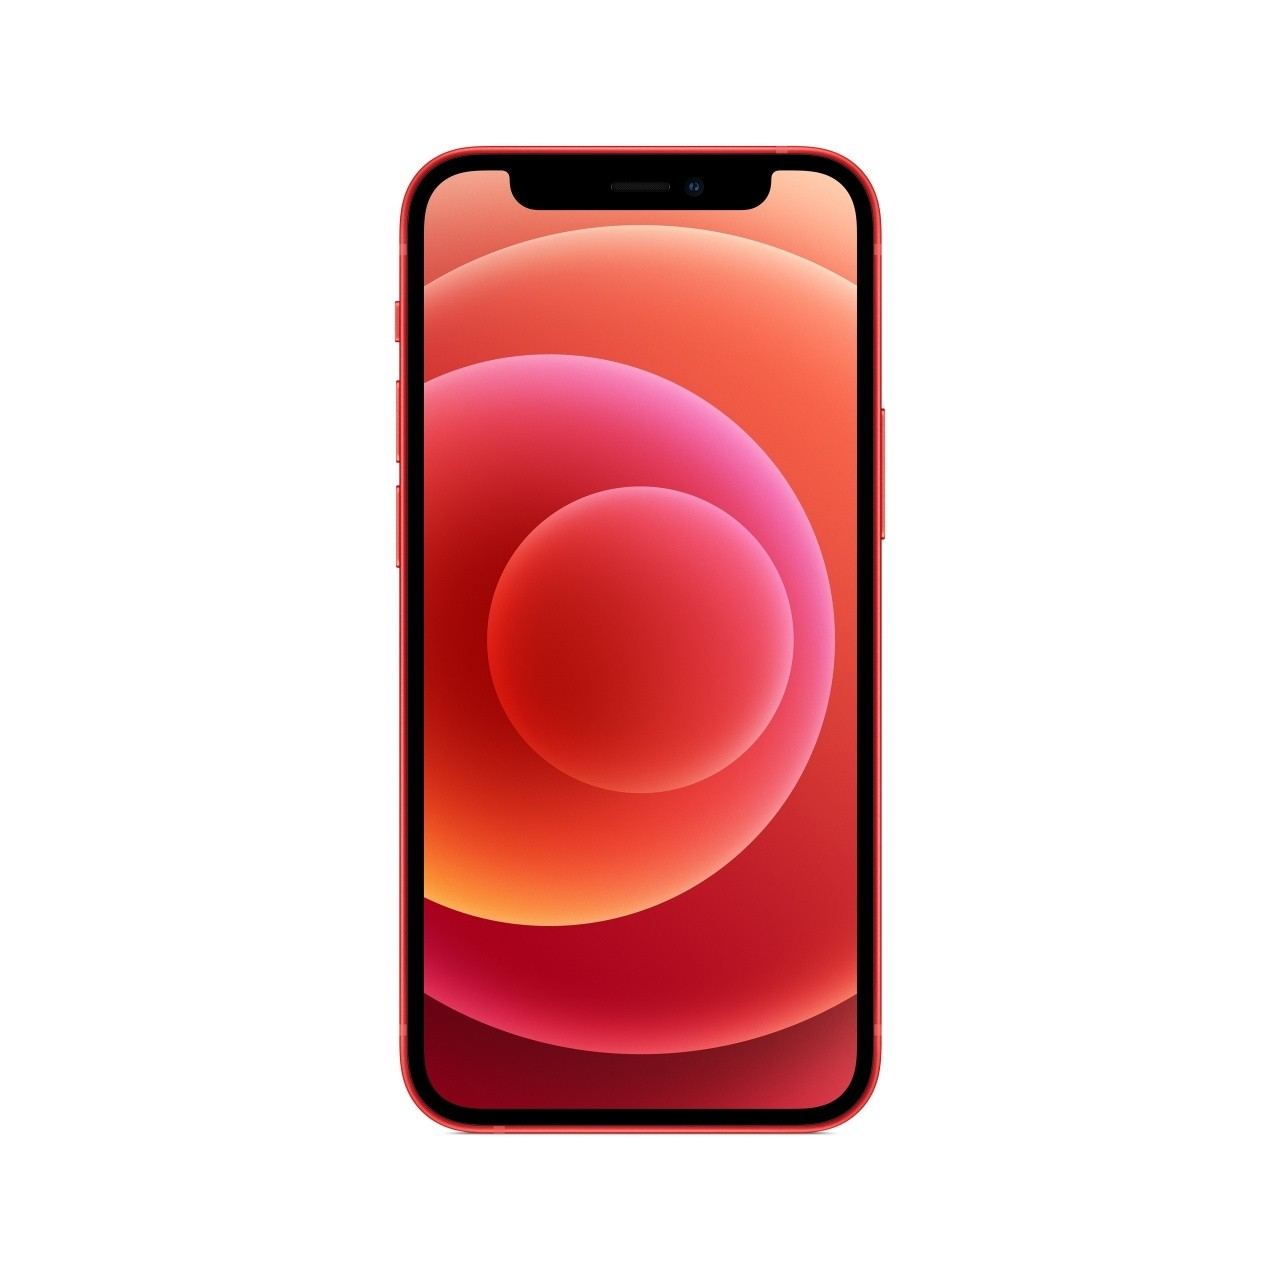 Apple iPhone 12 mini 64GB - (PRODUCT)RED